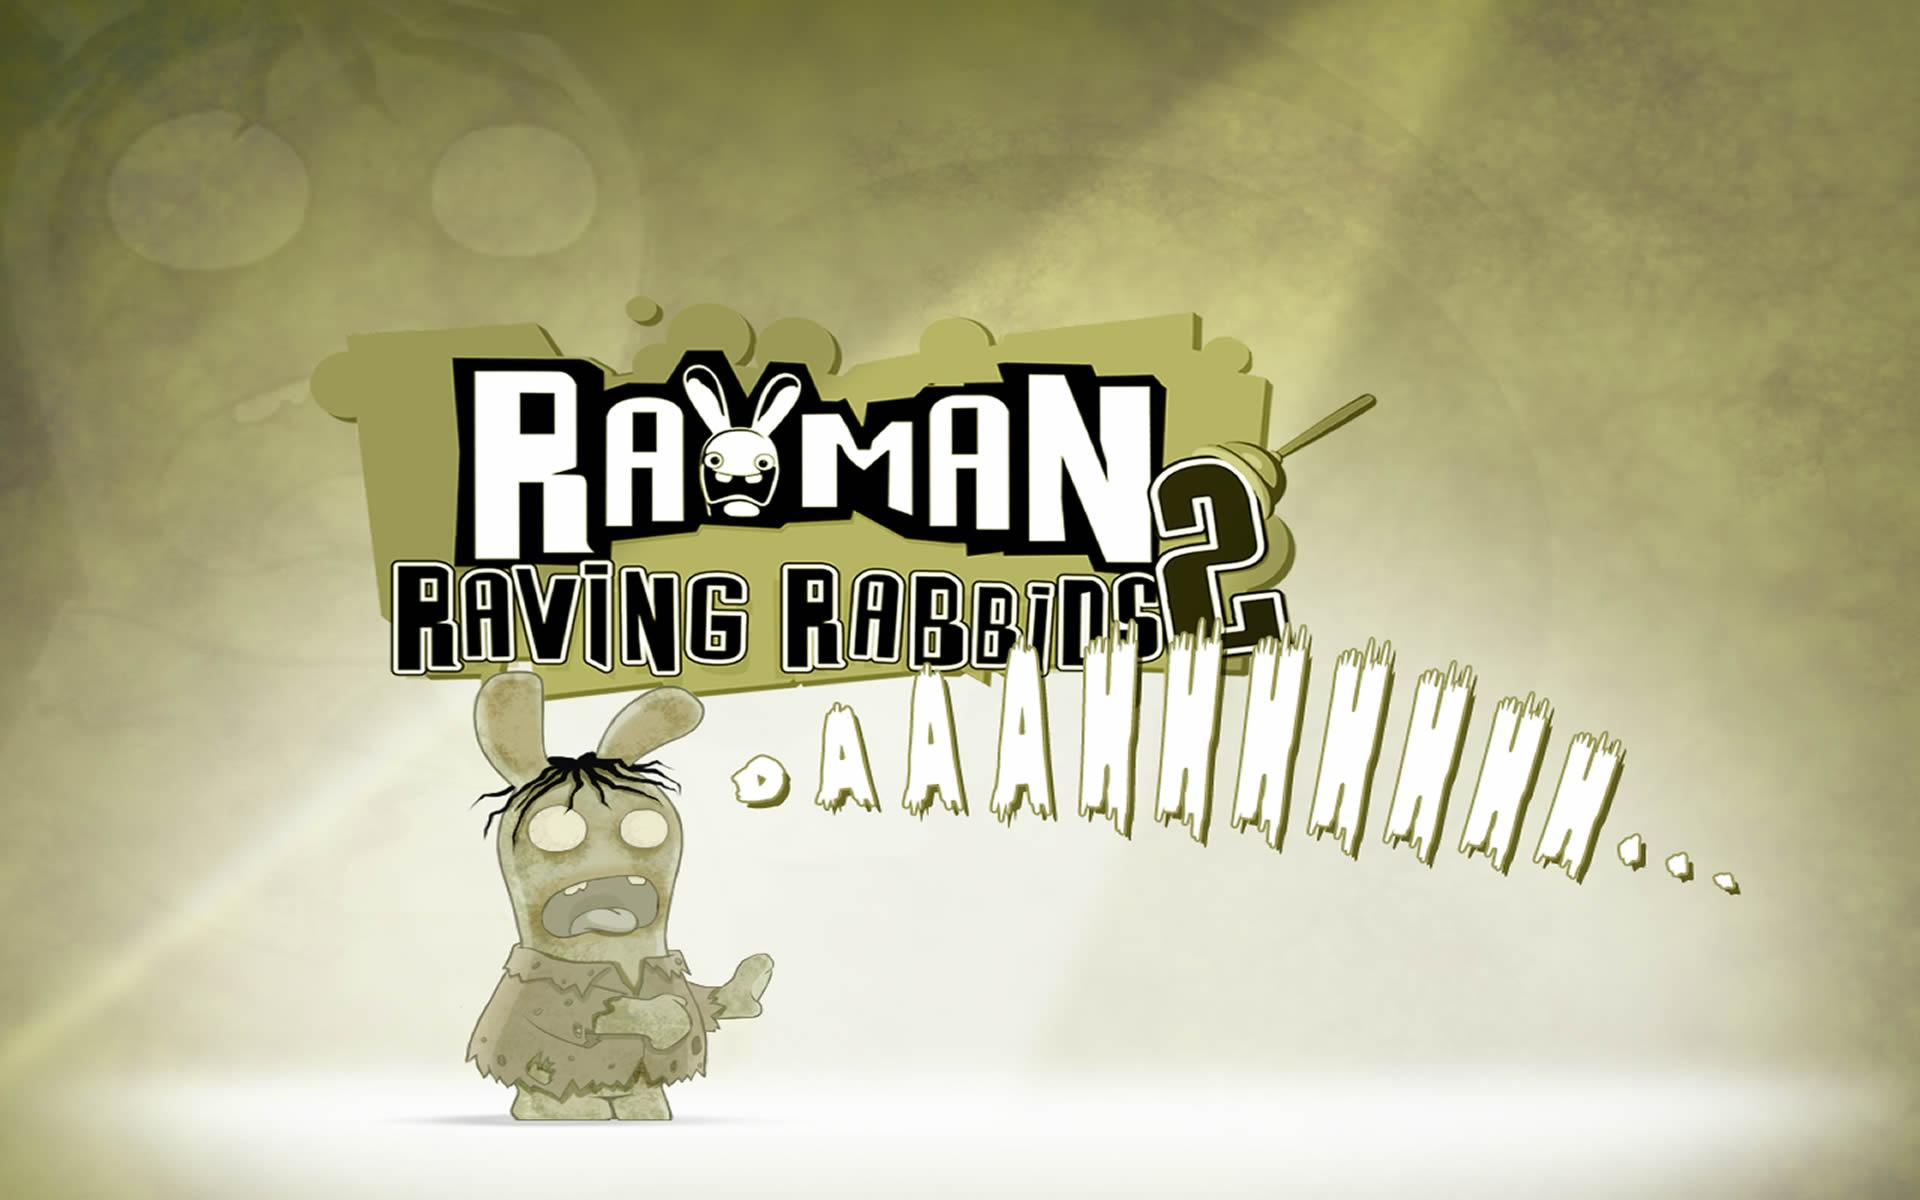 zombie - rayman raving rabbids wallpaper